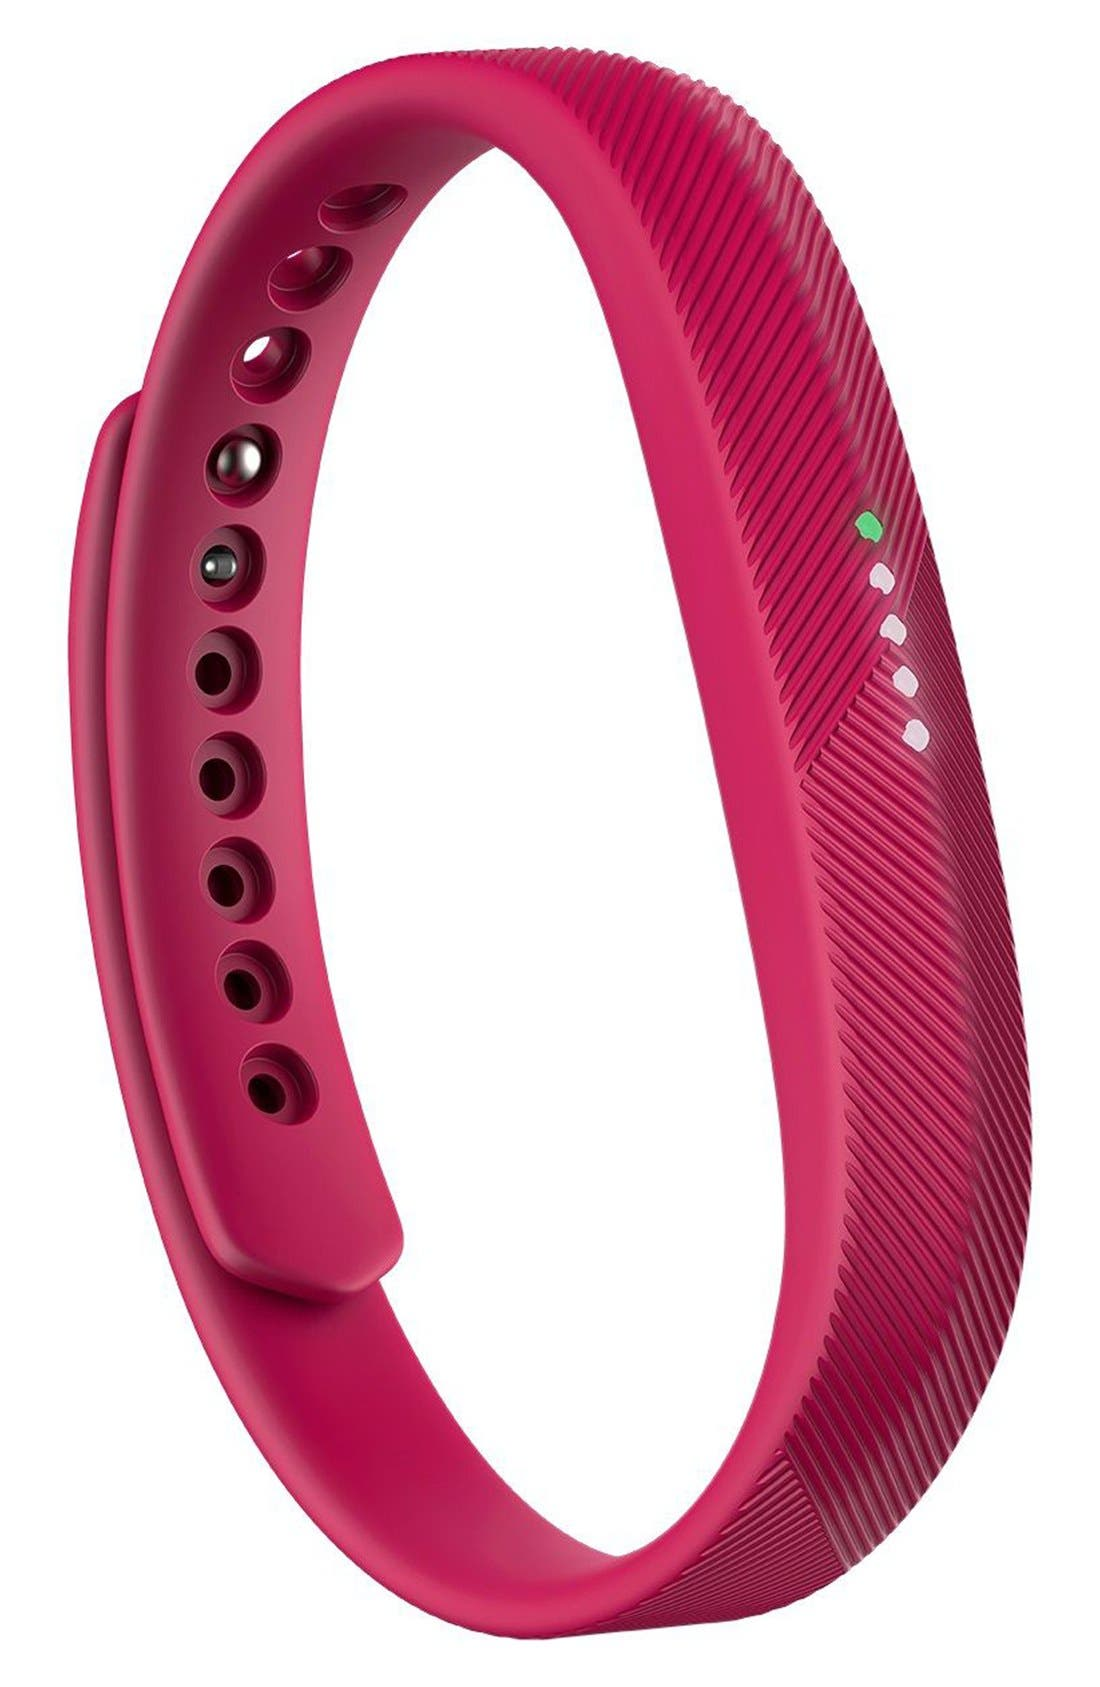 Alternate Image 1 Selected - Fitbit 'Flex 2' Wireless Activity & Sleep Wristband